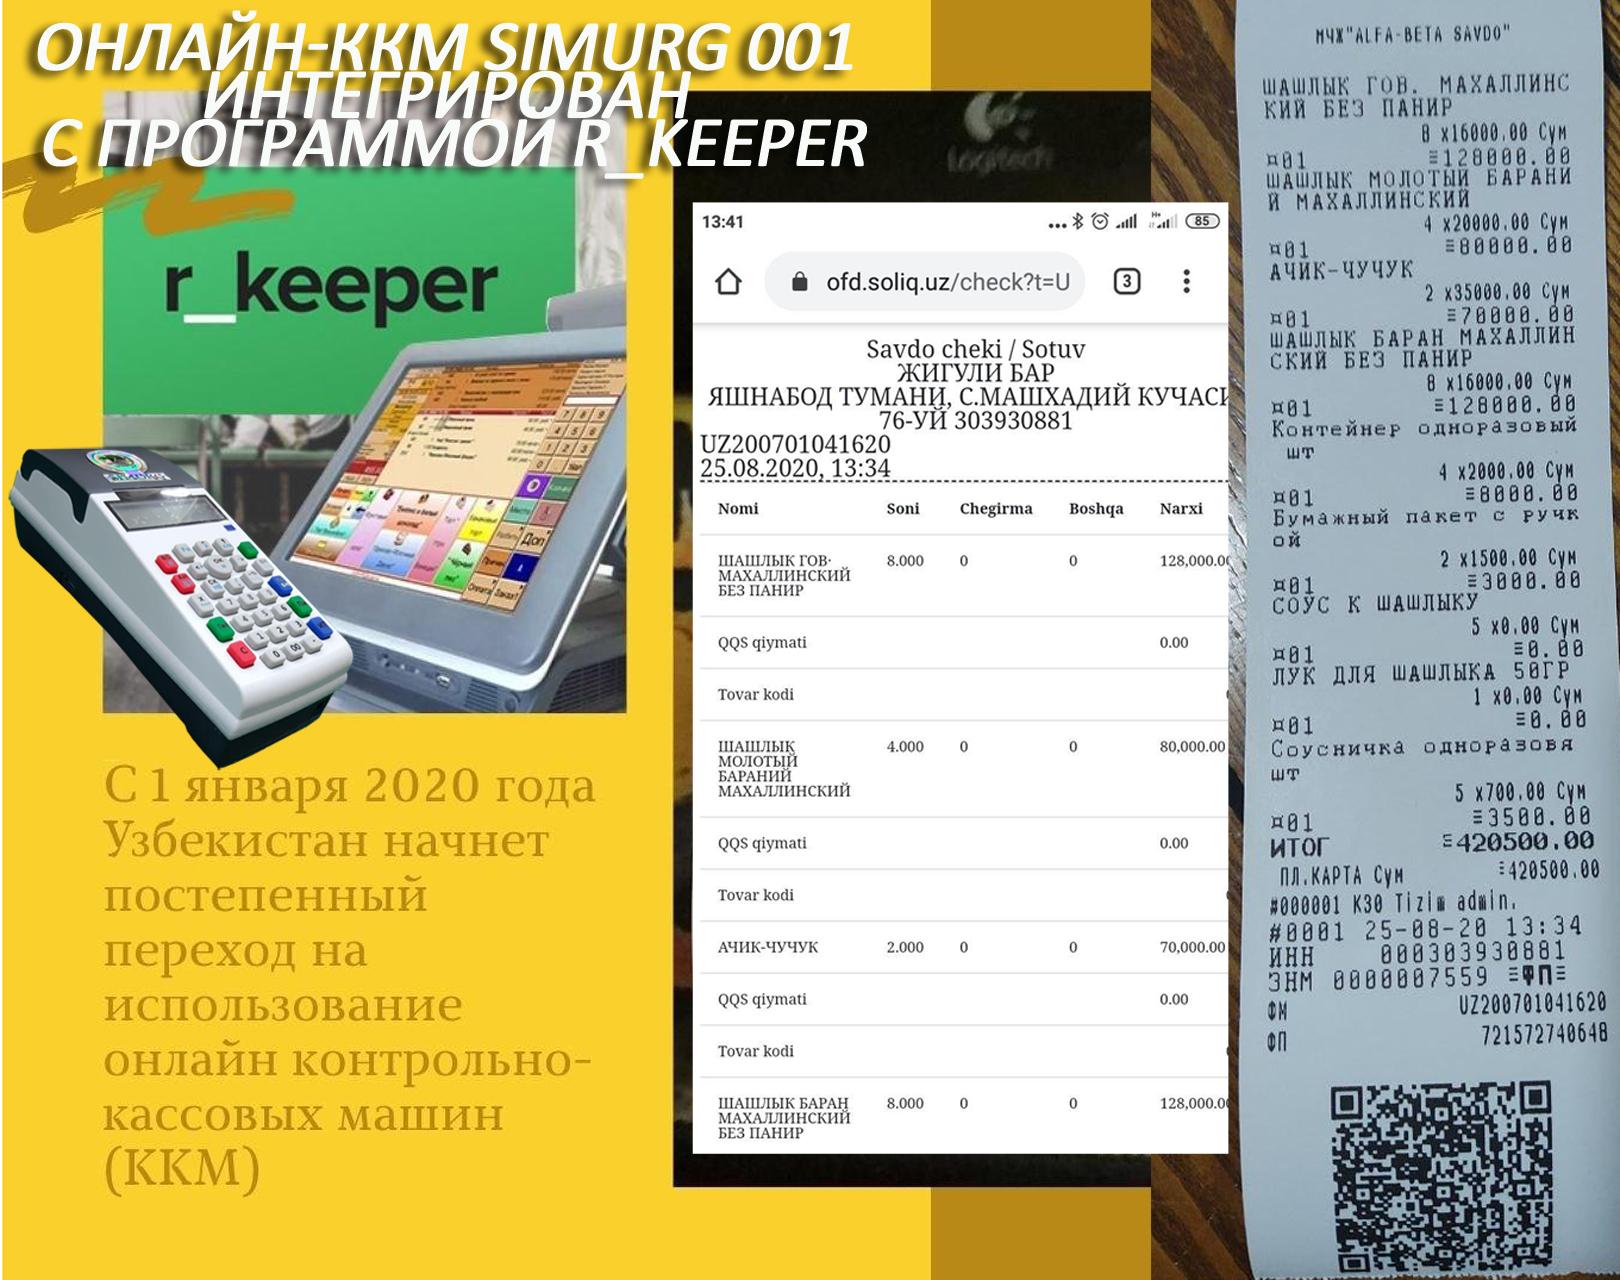 Онлайн-ККМ Simurg 001 интегрирован с программой автоматизации Rkeeper.